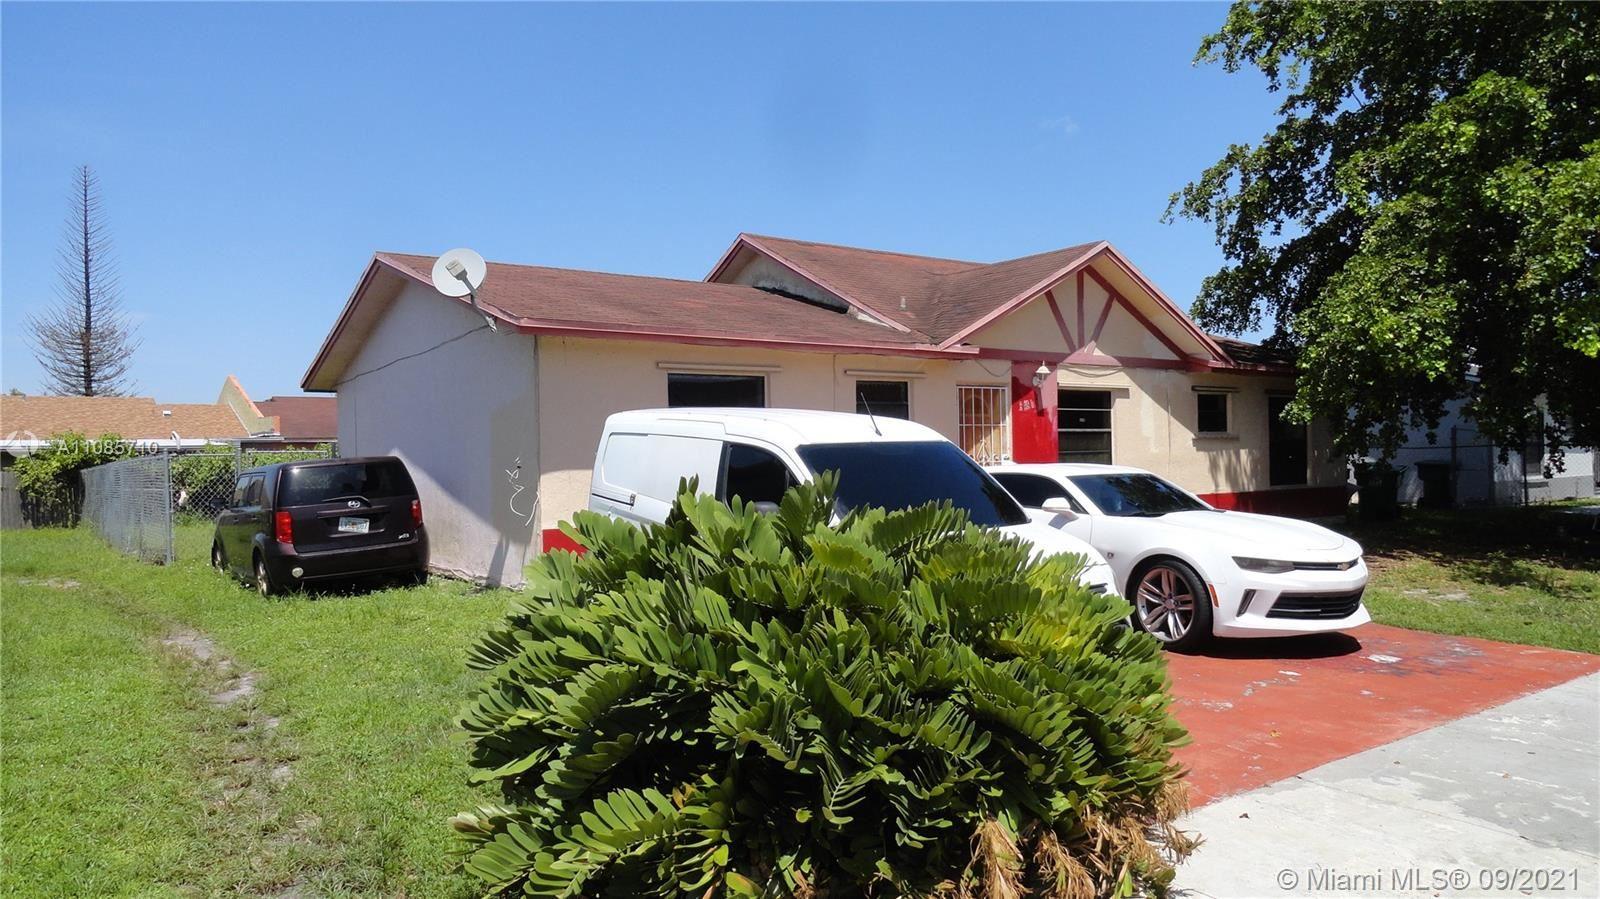 3461 NW 194th St, Miami Gardens, FL 33056 - #: A11085710